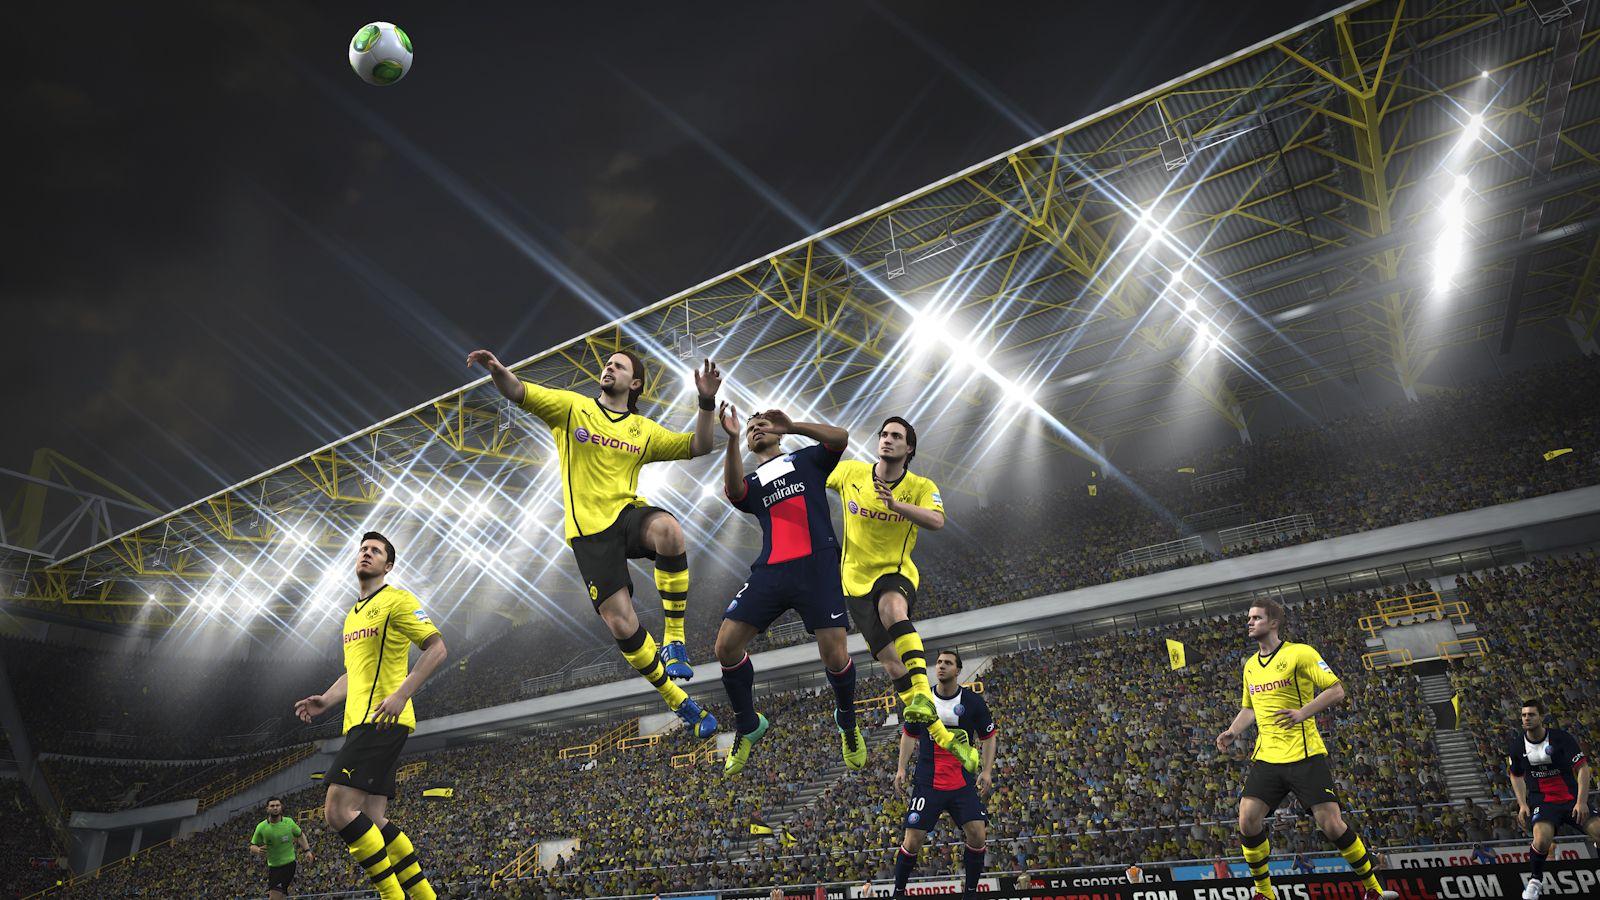 FIFA 14 / fifa14_ps4_dortmund_psg_inairplay